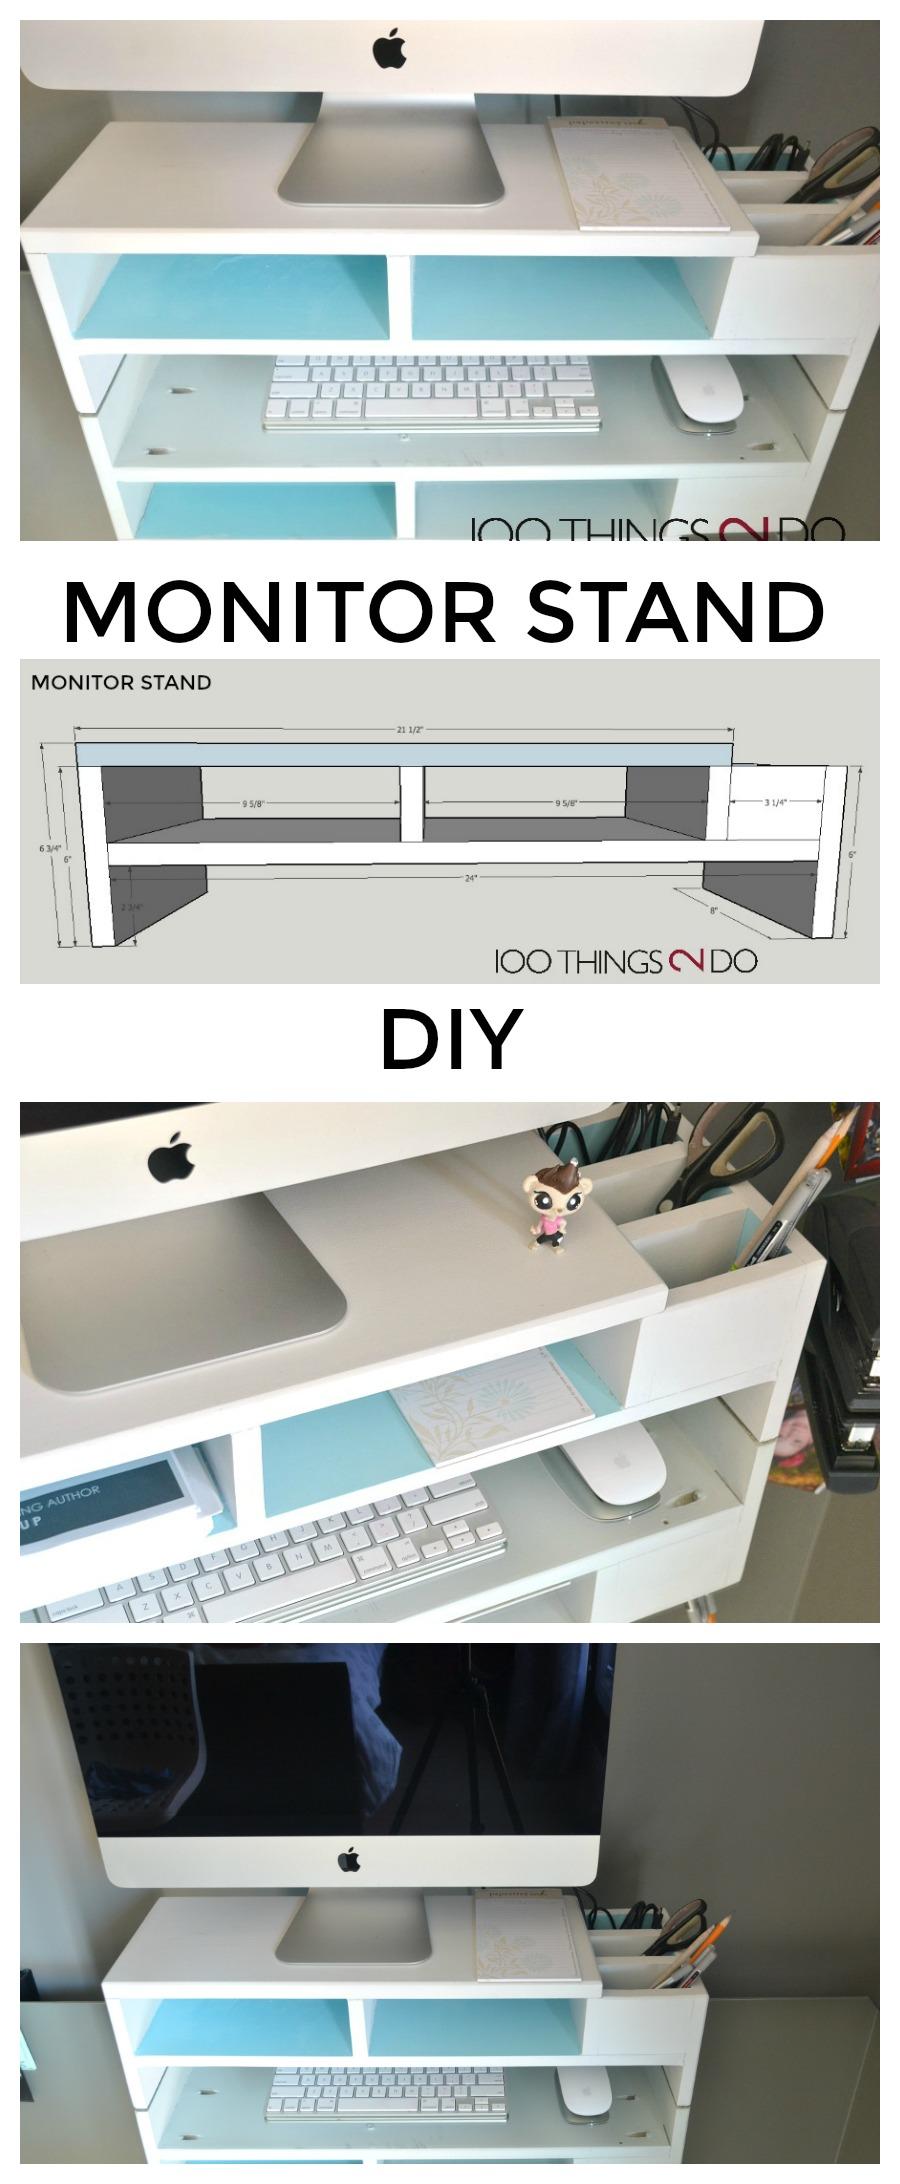 DIY monitor stand, monitor stand, desk organization